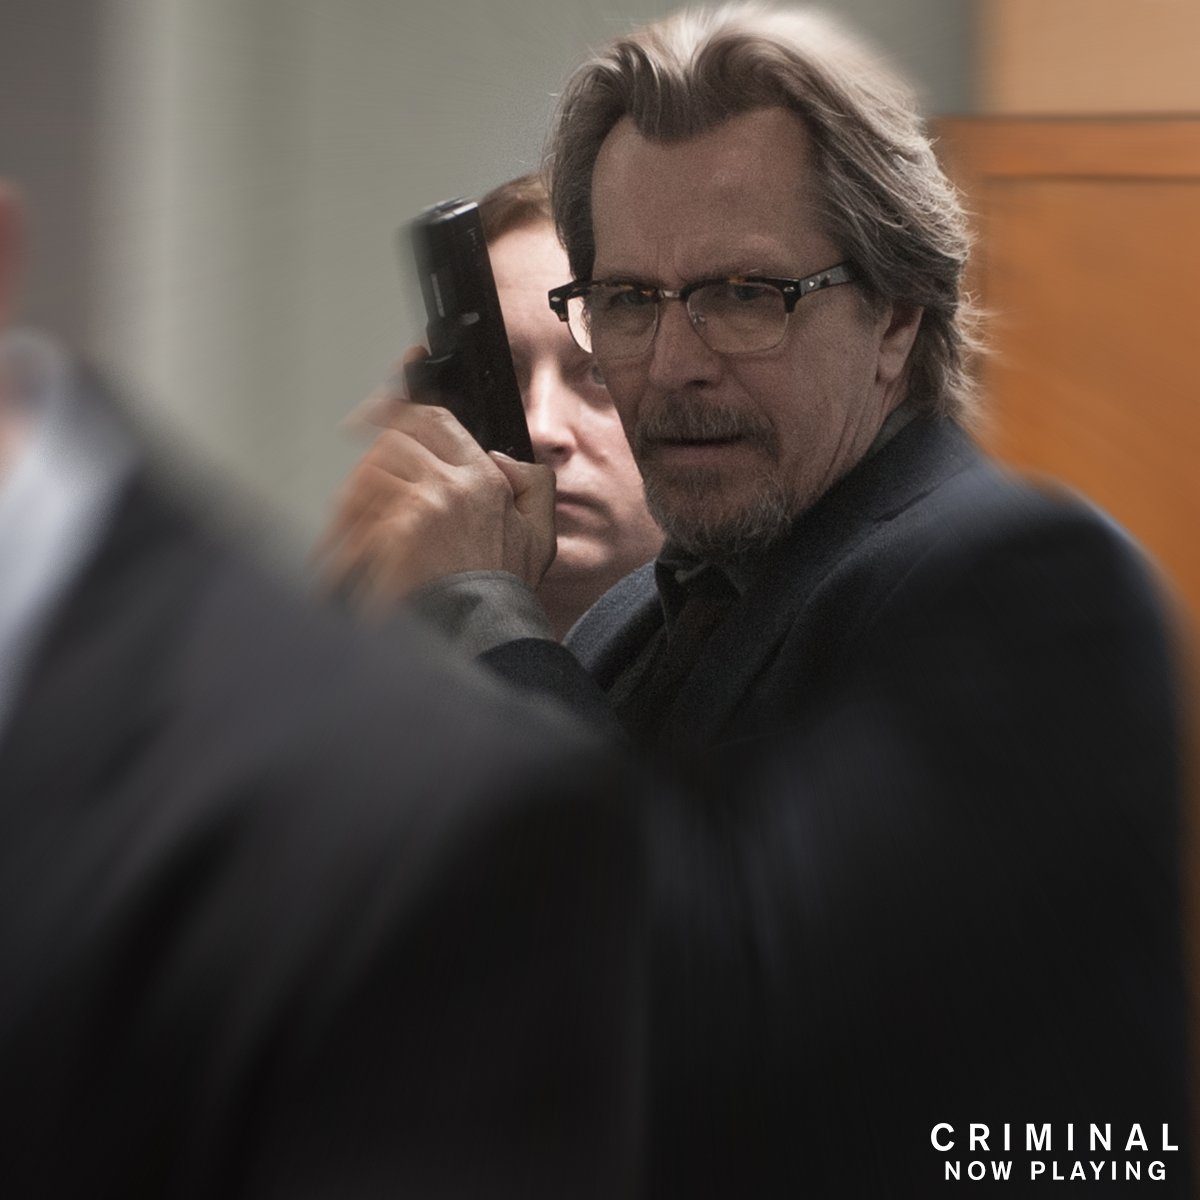 Preview Film: Criminal (2016)